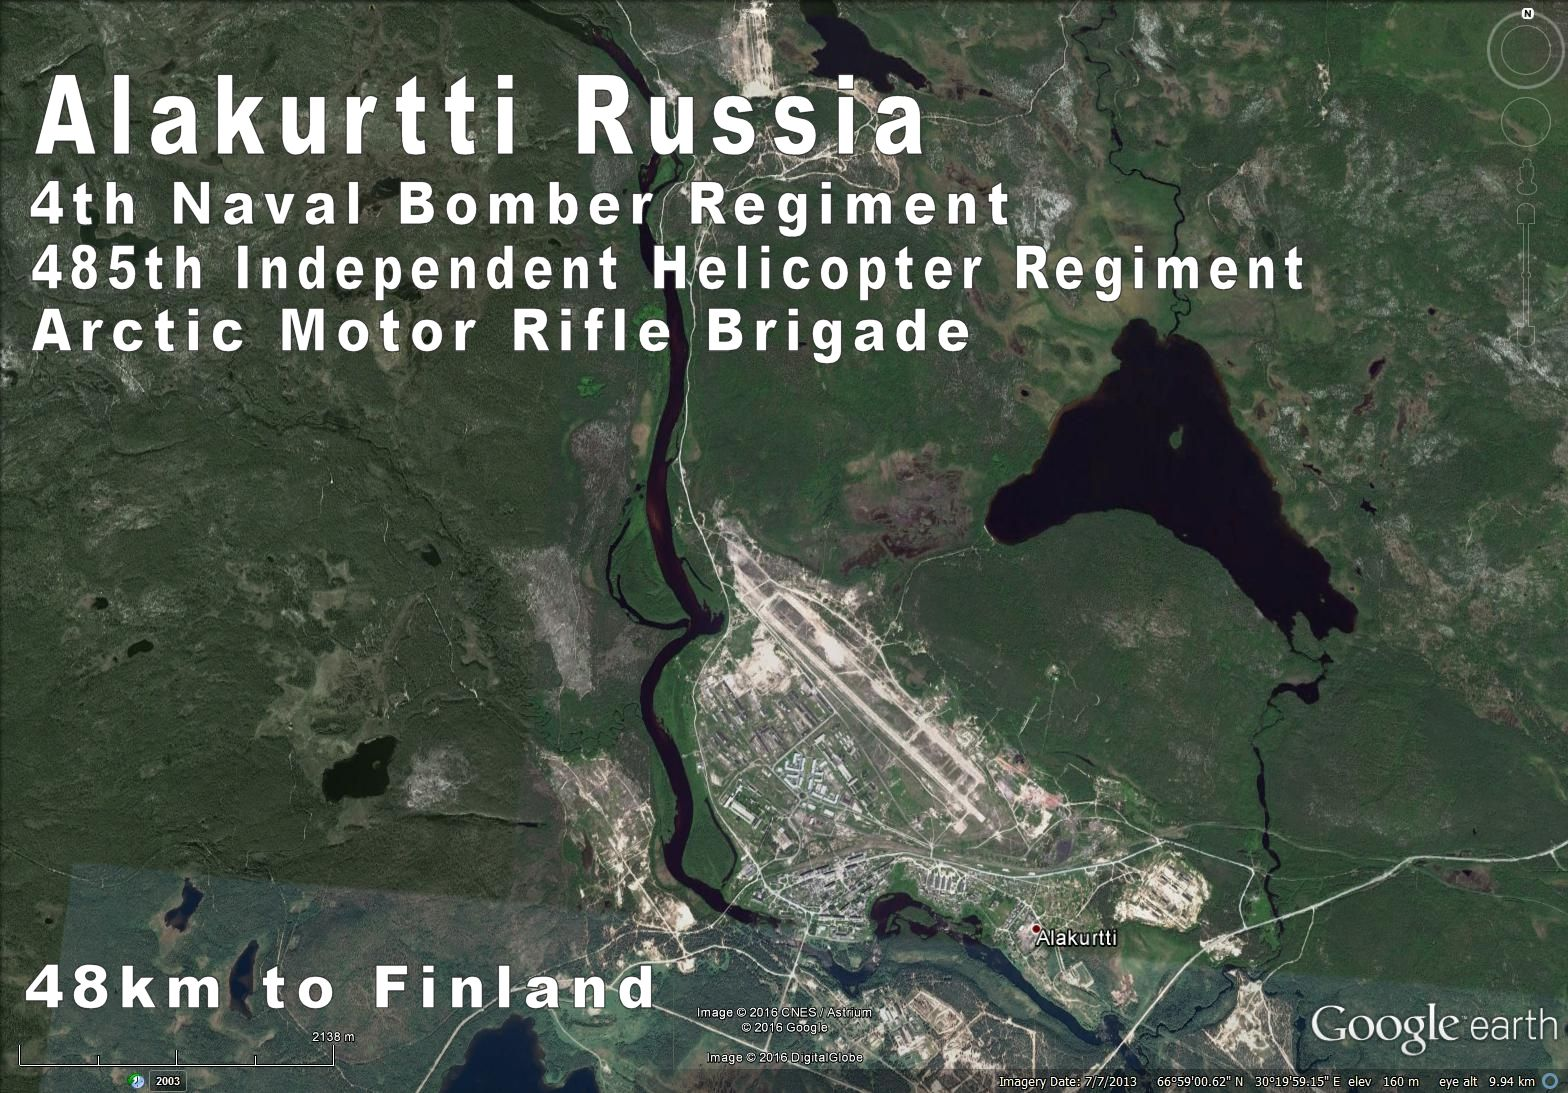 Alakurtti Russia Military base for 2 aviation